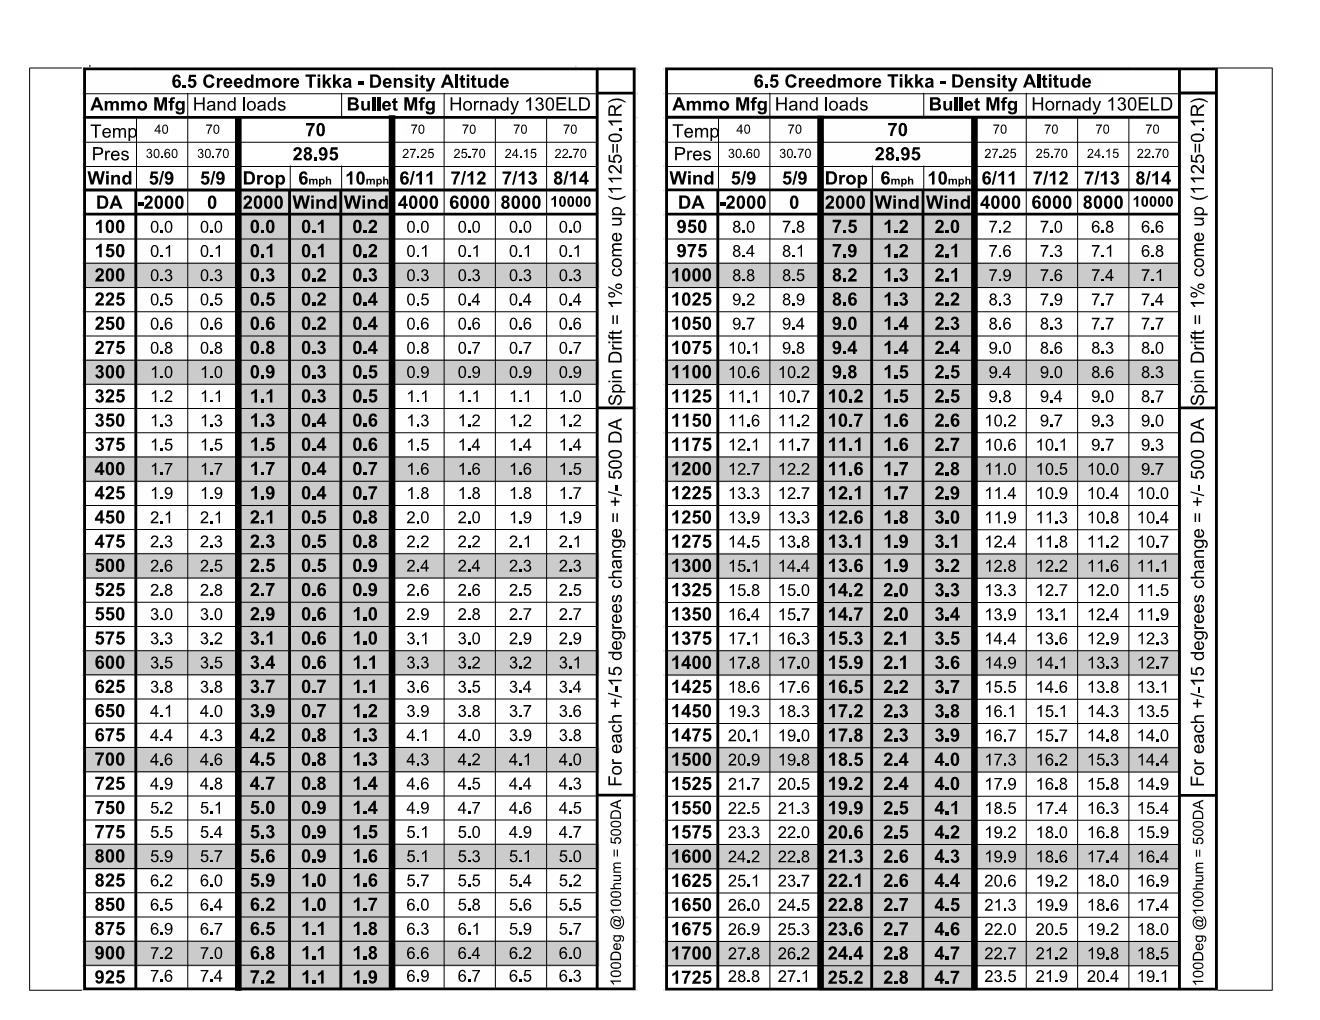 Tikka 6.5 Creed HL 130ELD 2019-10-17 Density Altitude 1.jpg